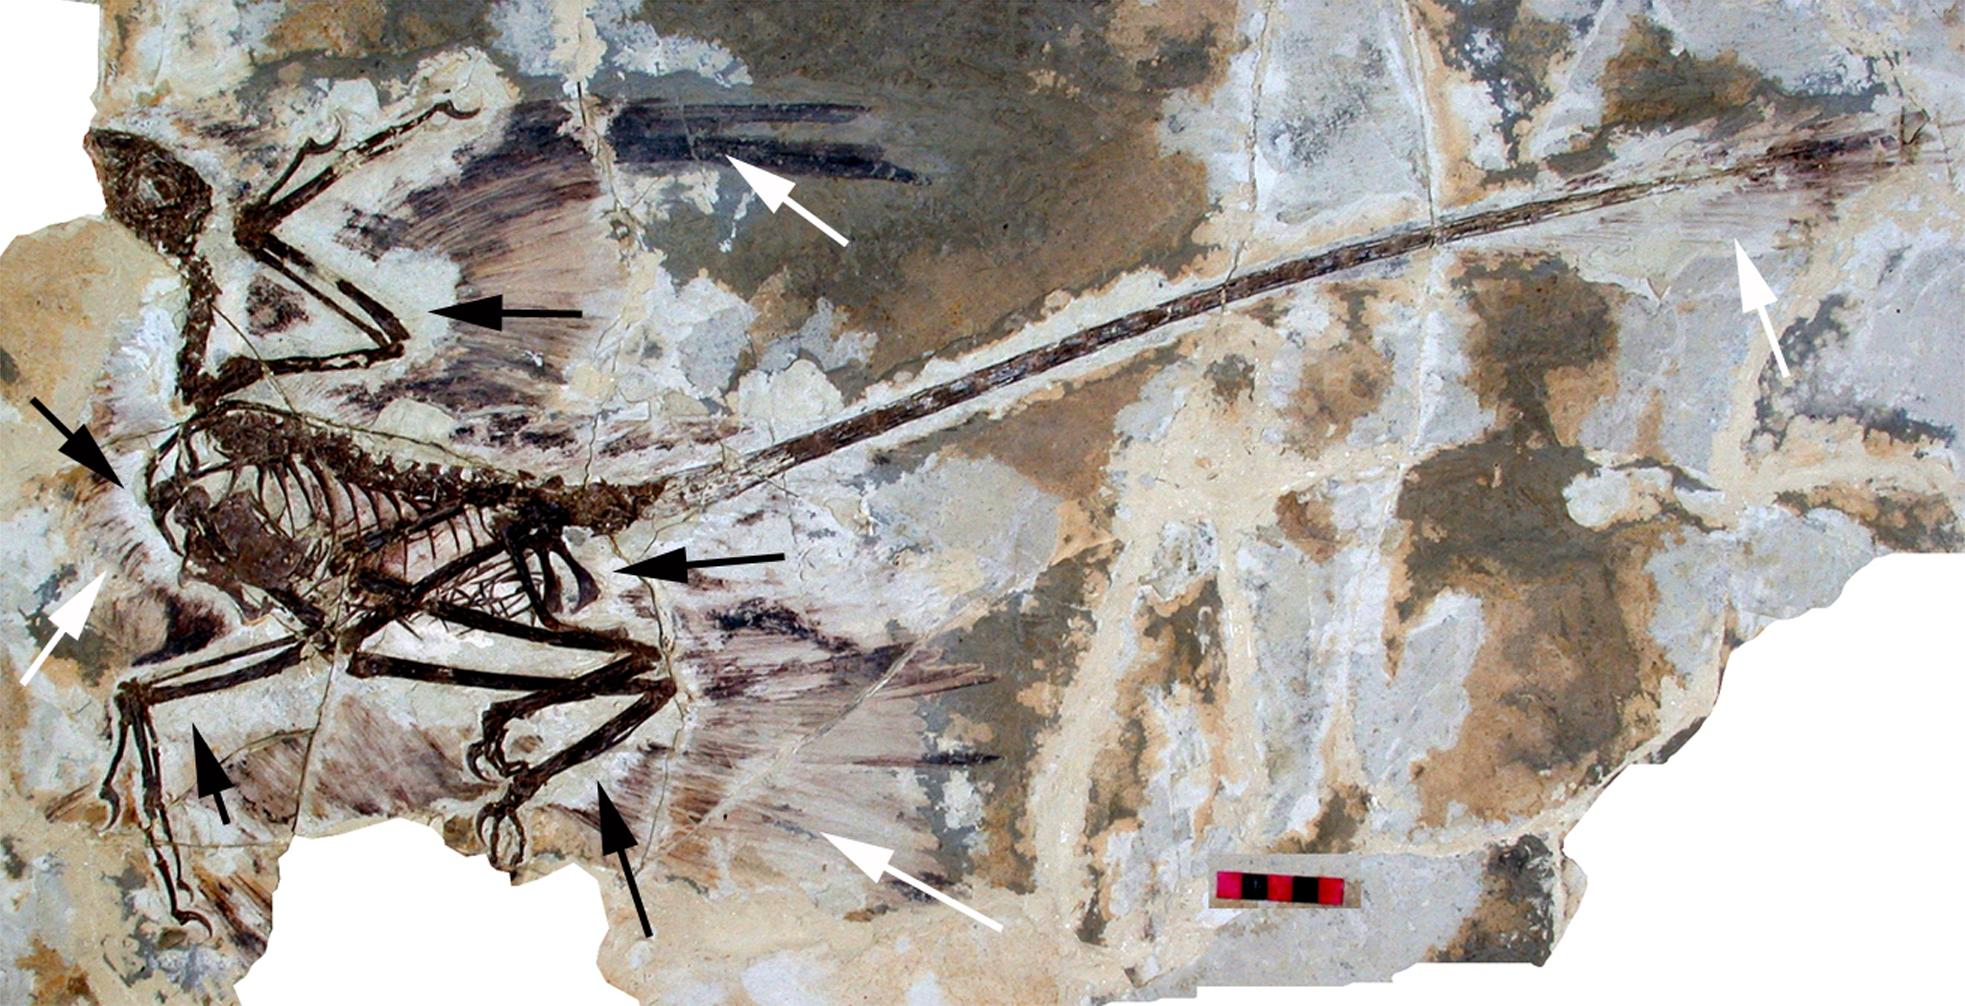 raptormaniacs back to the basics maniraptor feathers